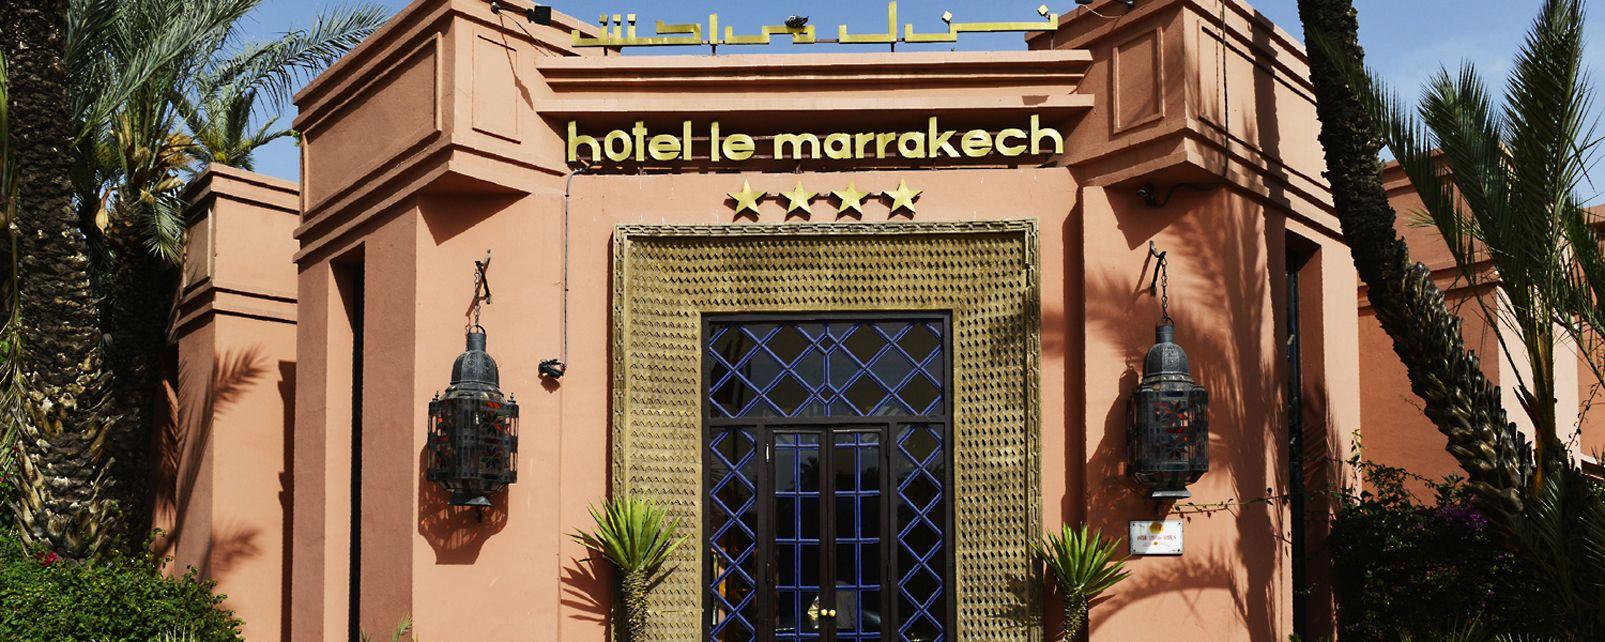 h tel le marrakech marrakech maroc. Black Bedroom Furniture Sets. Home Design Ideas